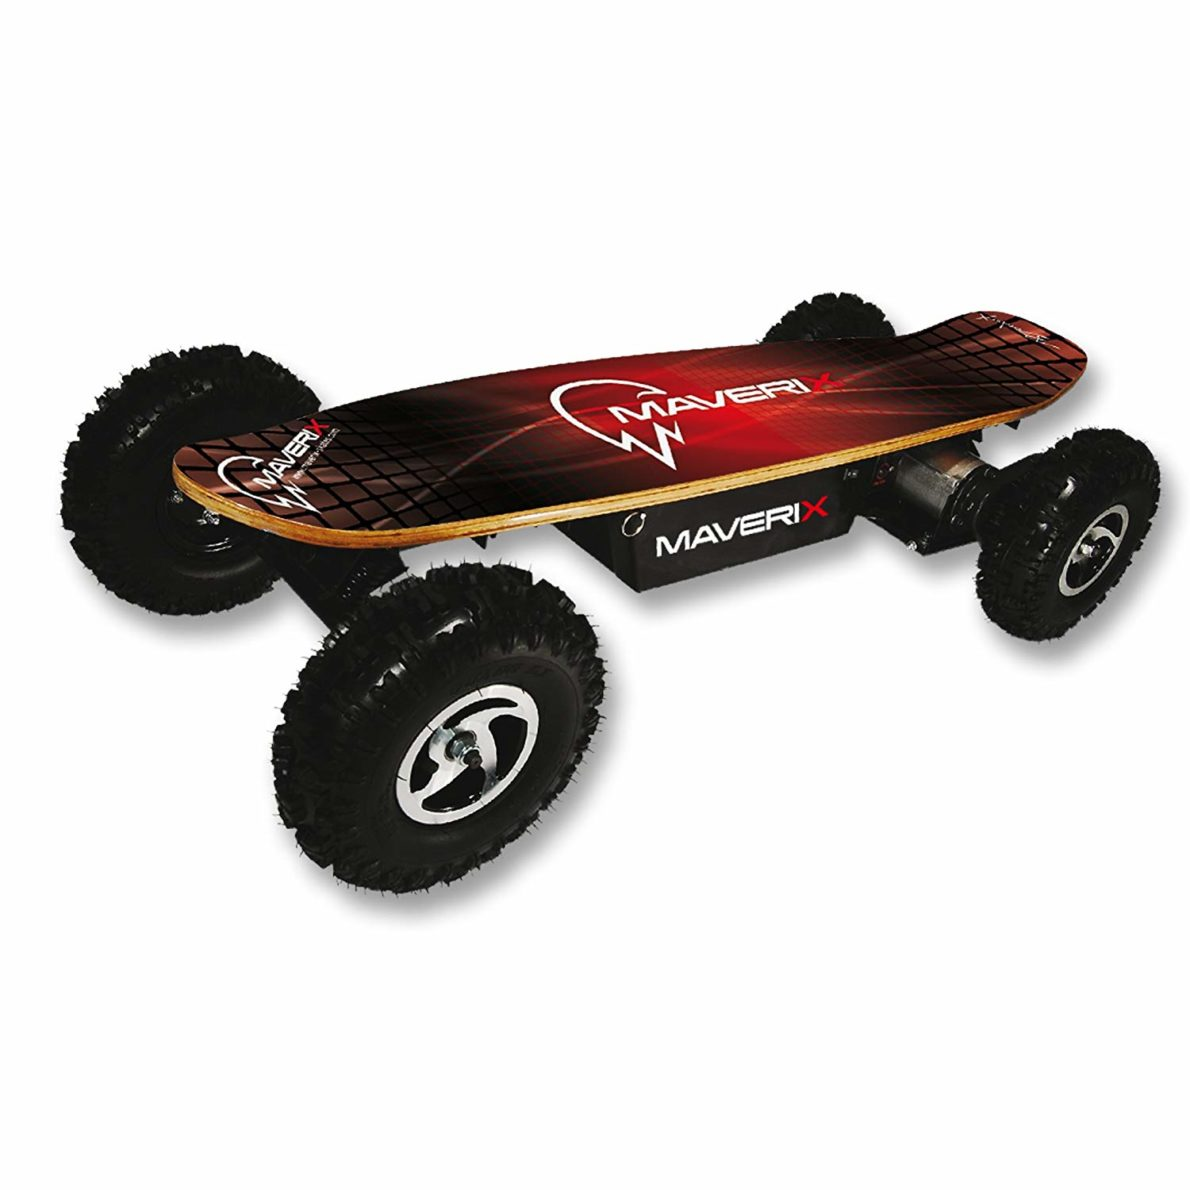 Maverix USA Border X 800W Skateboards, Red, 42-Inch